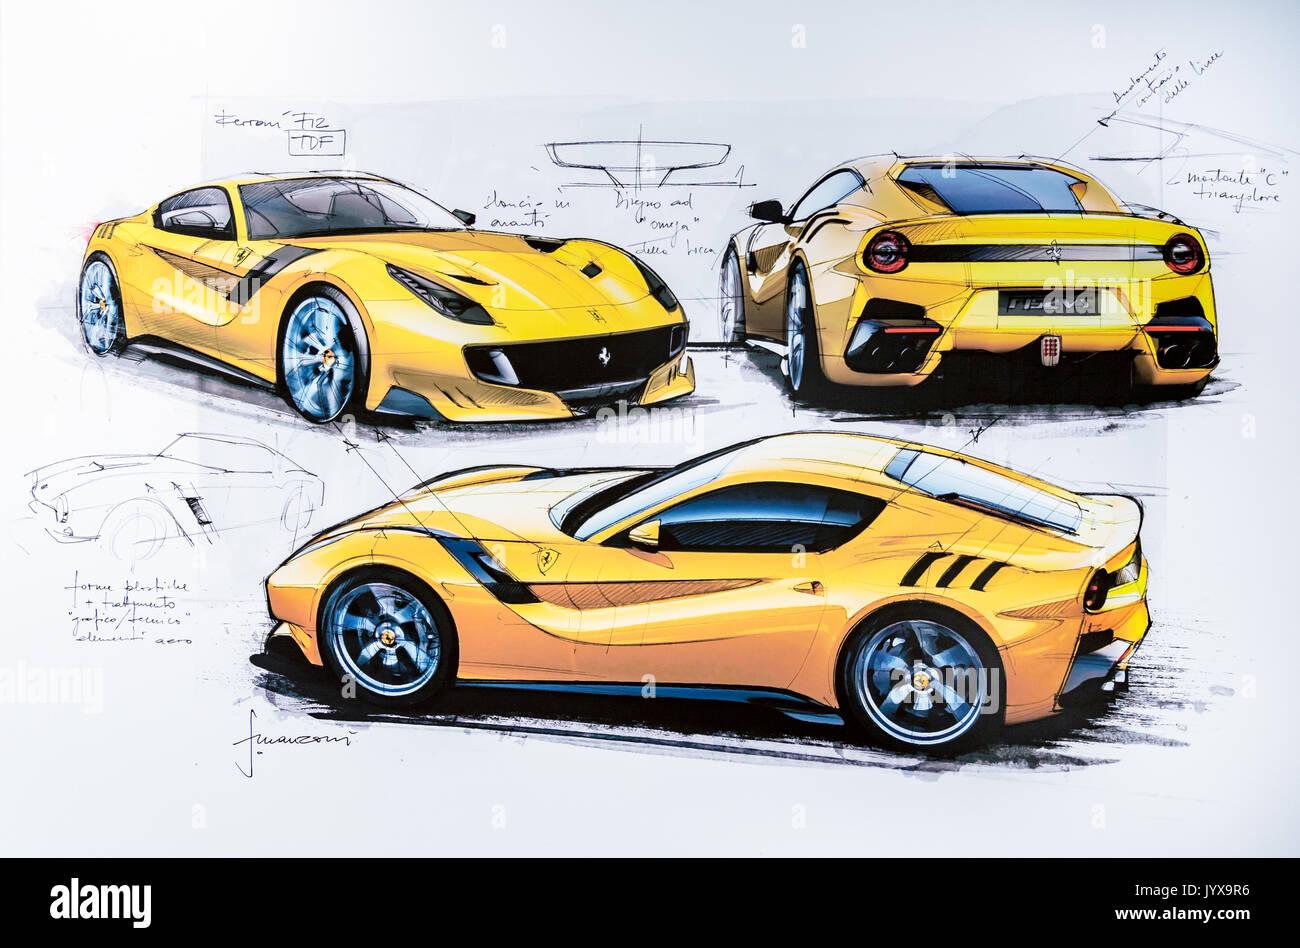 Concept Car Sketch Stockfotos & Concept Car Sketch Bilder - Alamy